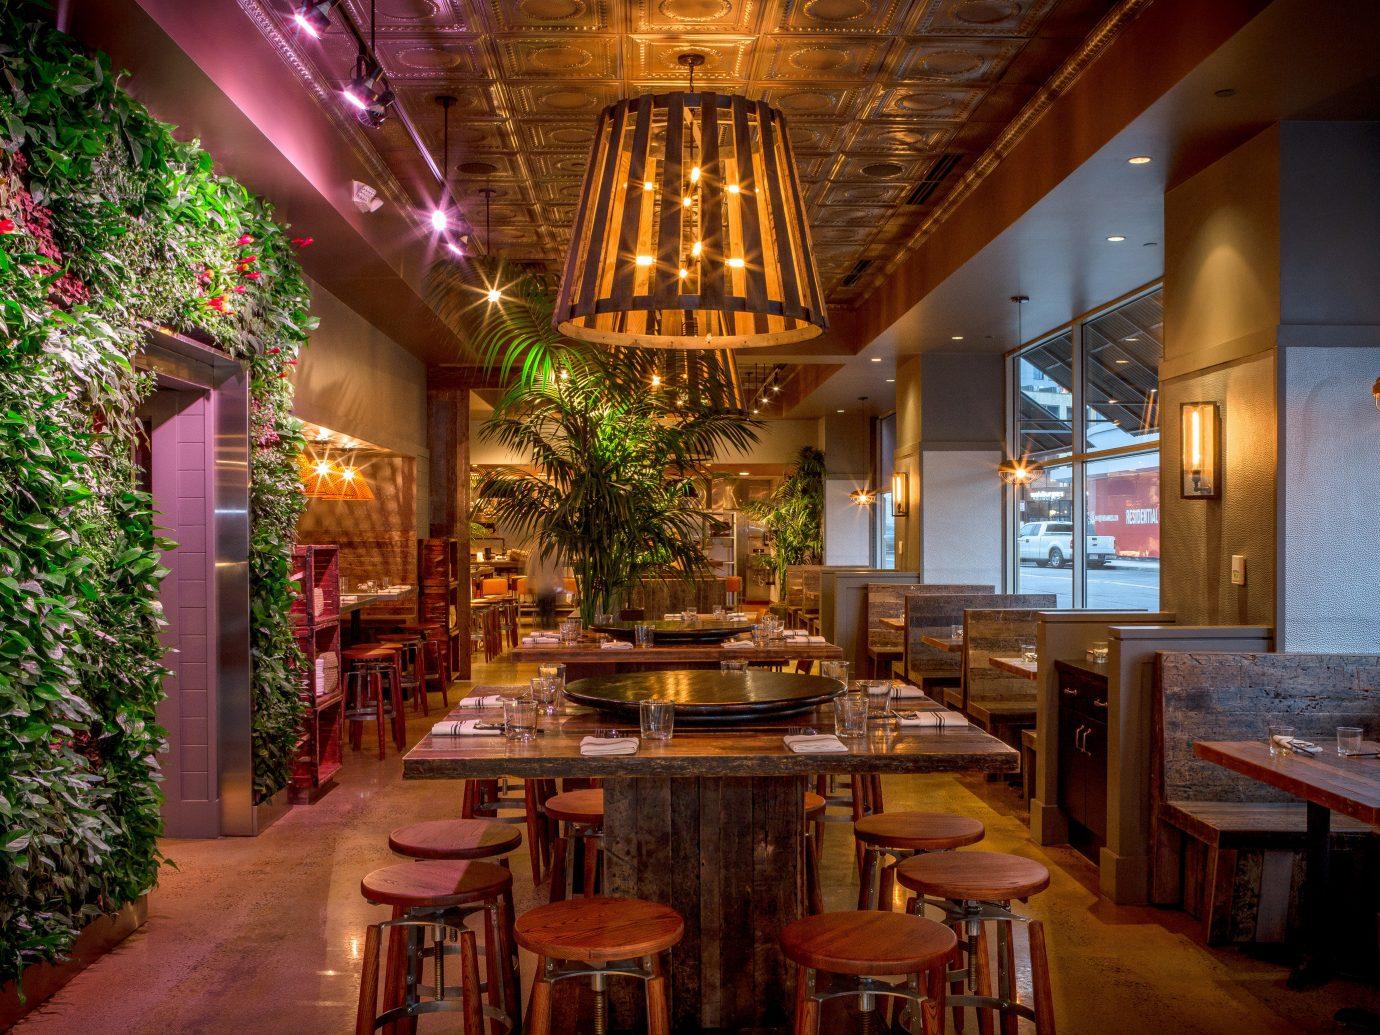 Food + Drink table indoor restaurant interior design café tavern several